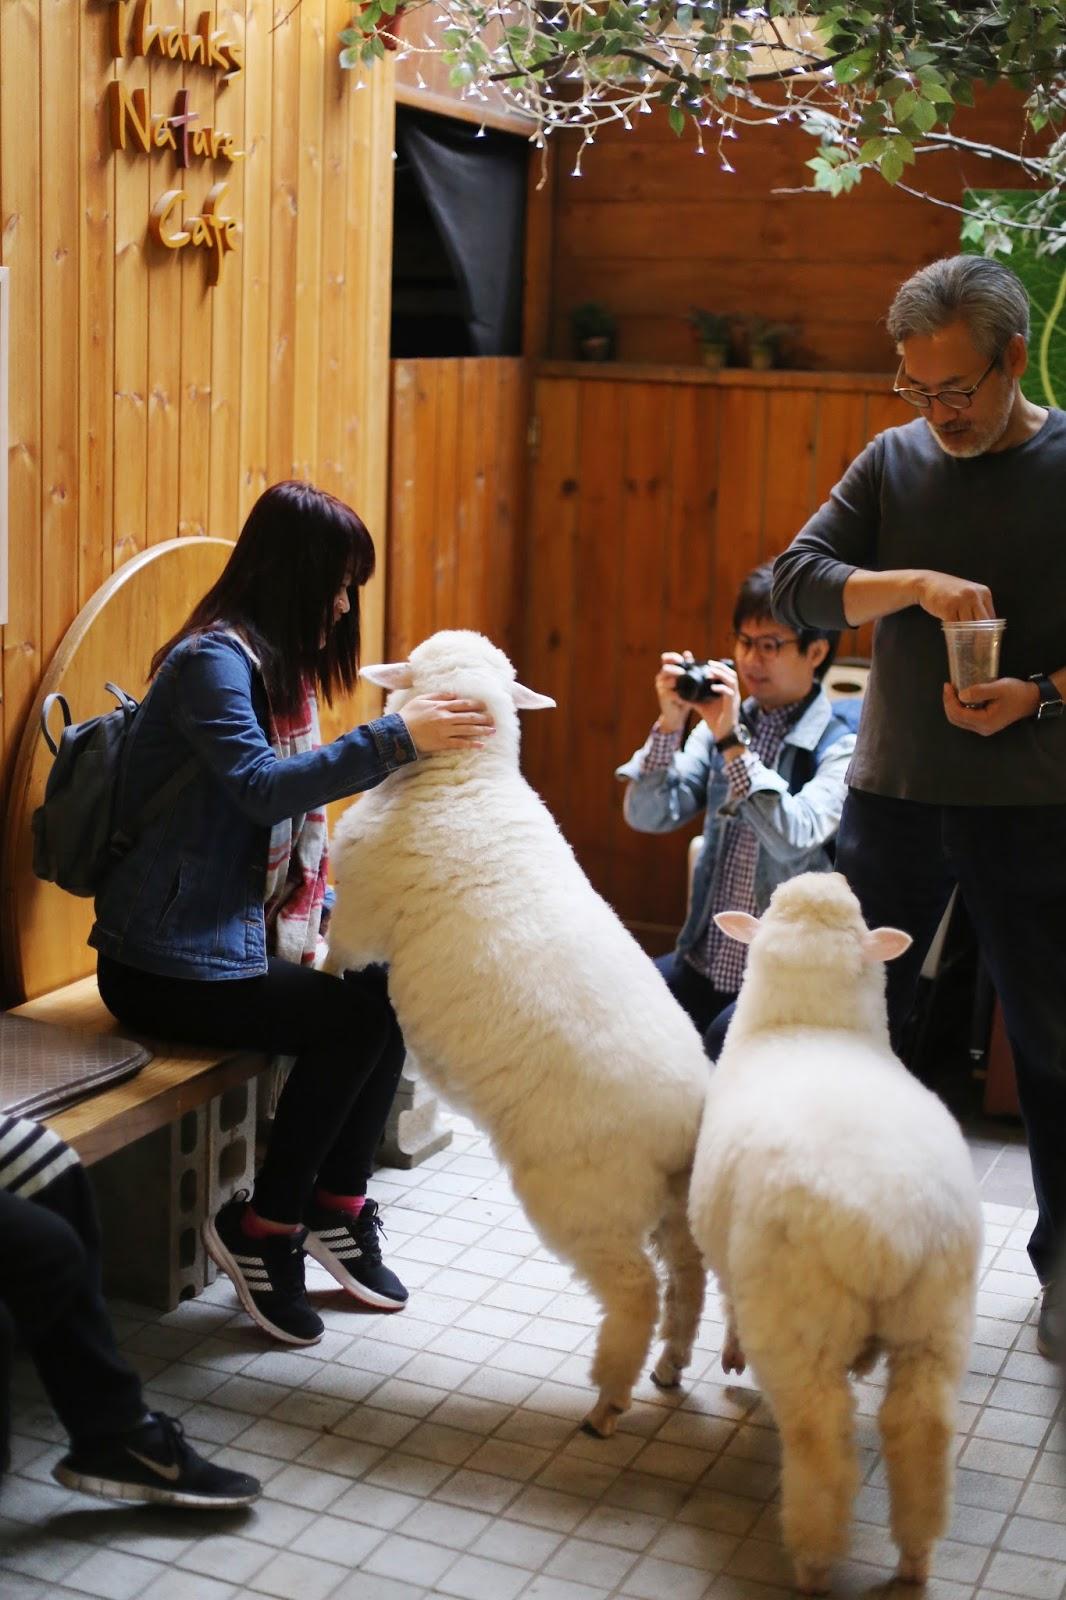 Thanks Nature 'sheep café' in Hongdae, Seoul